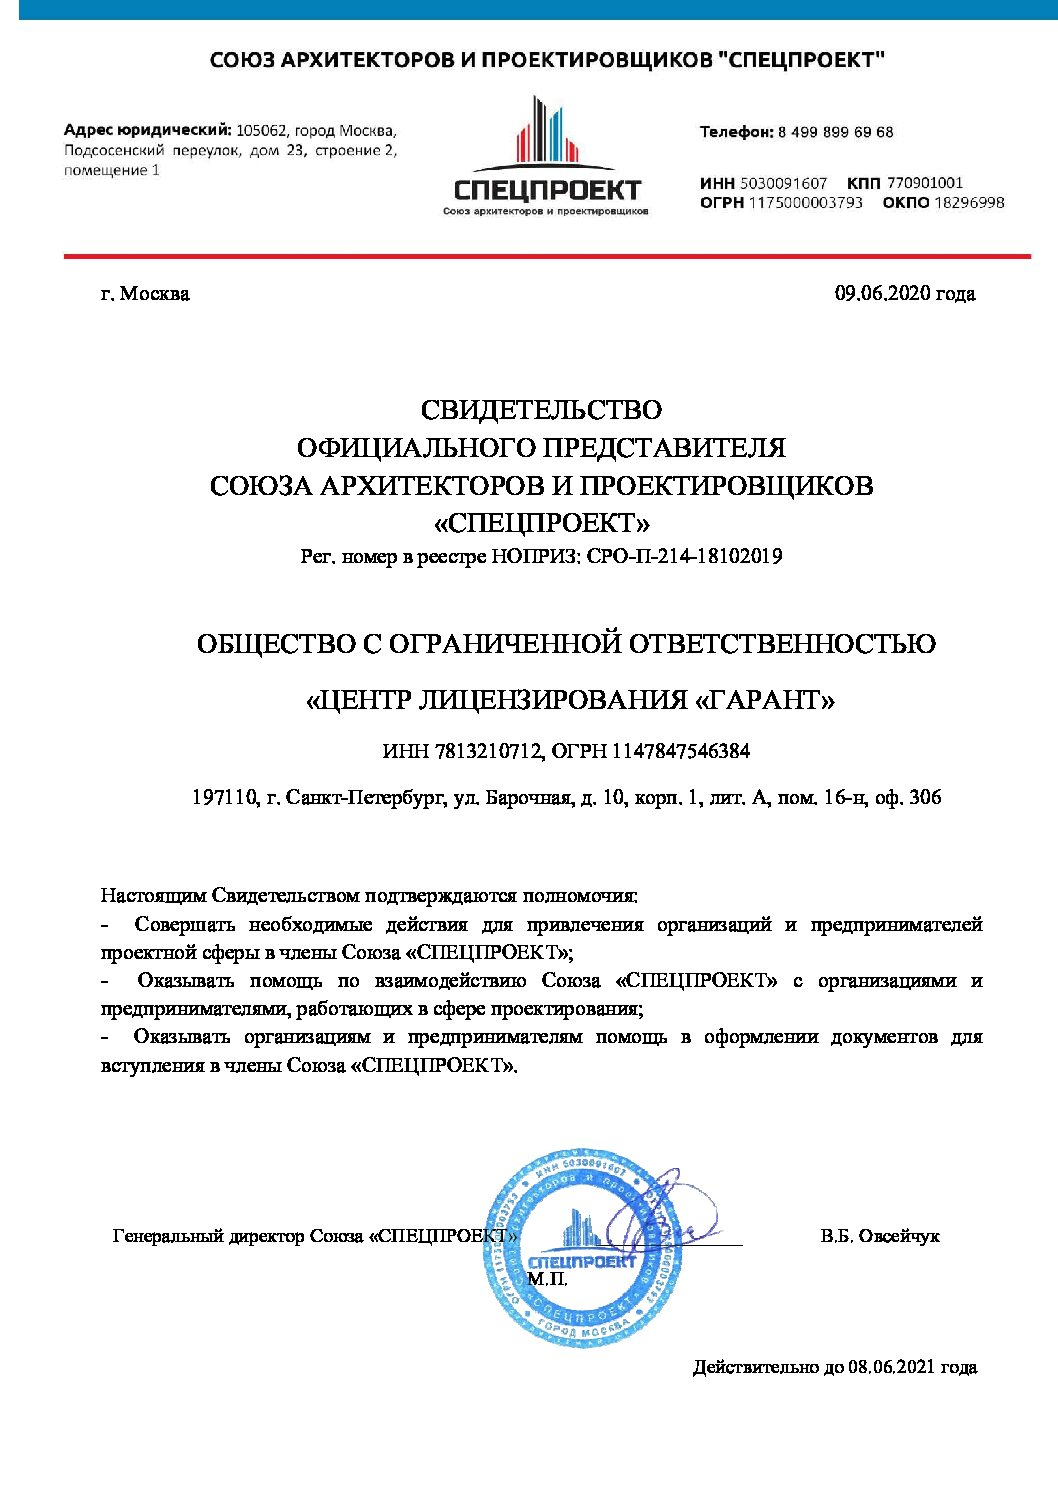 Аккредитация СПЕЦПРОЕКТ